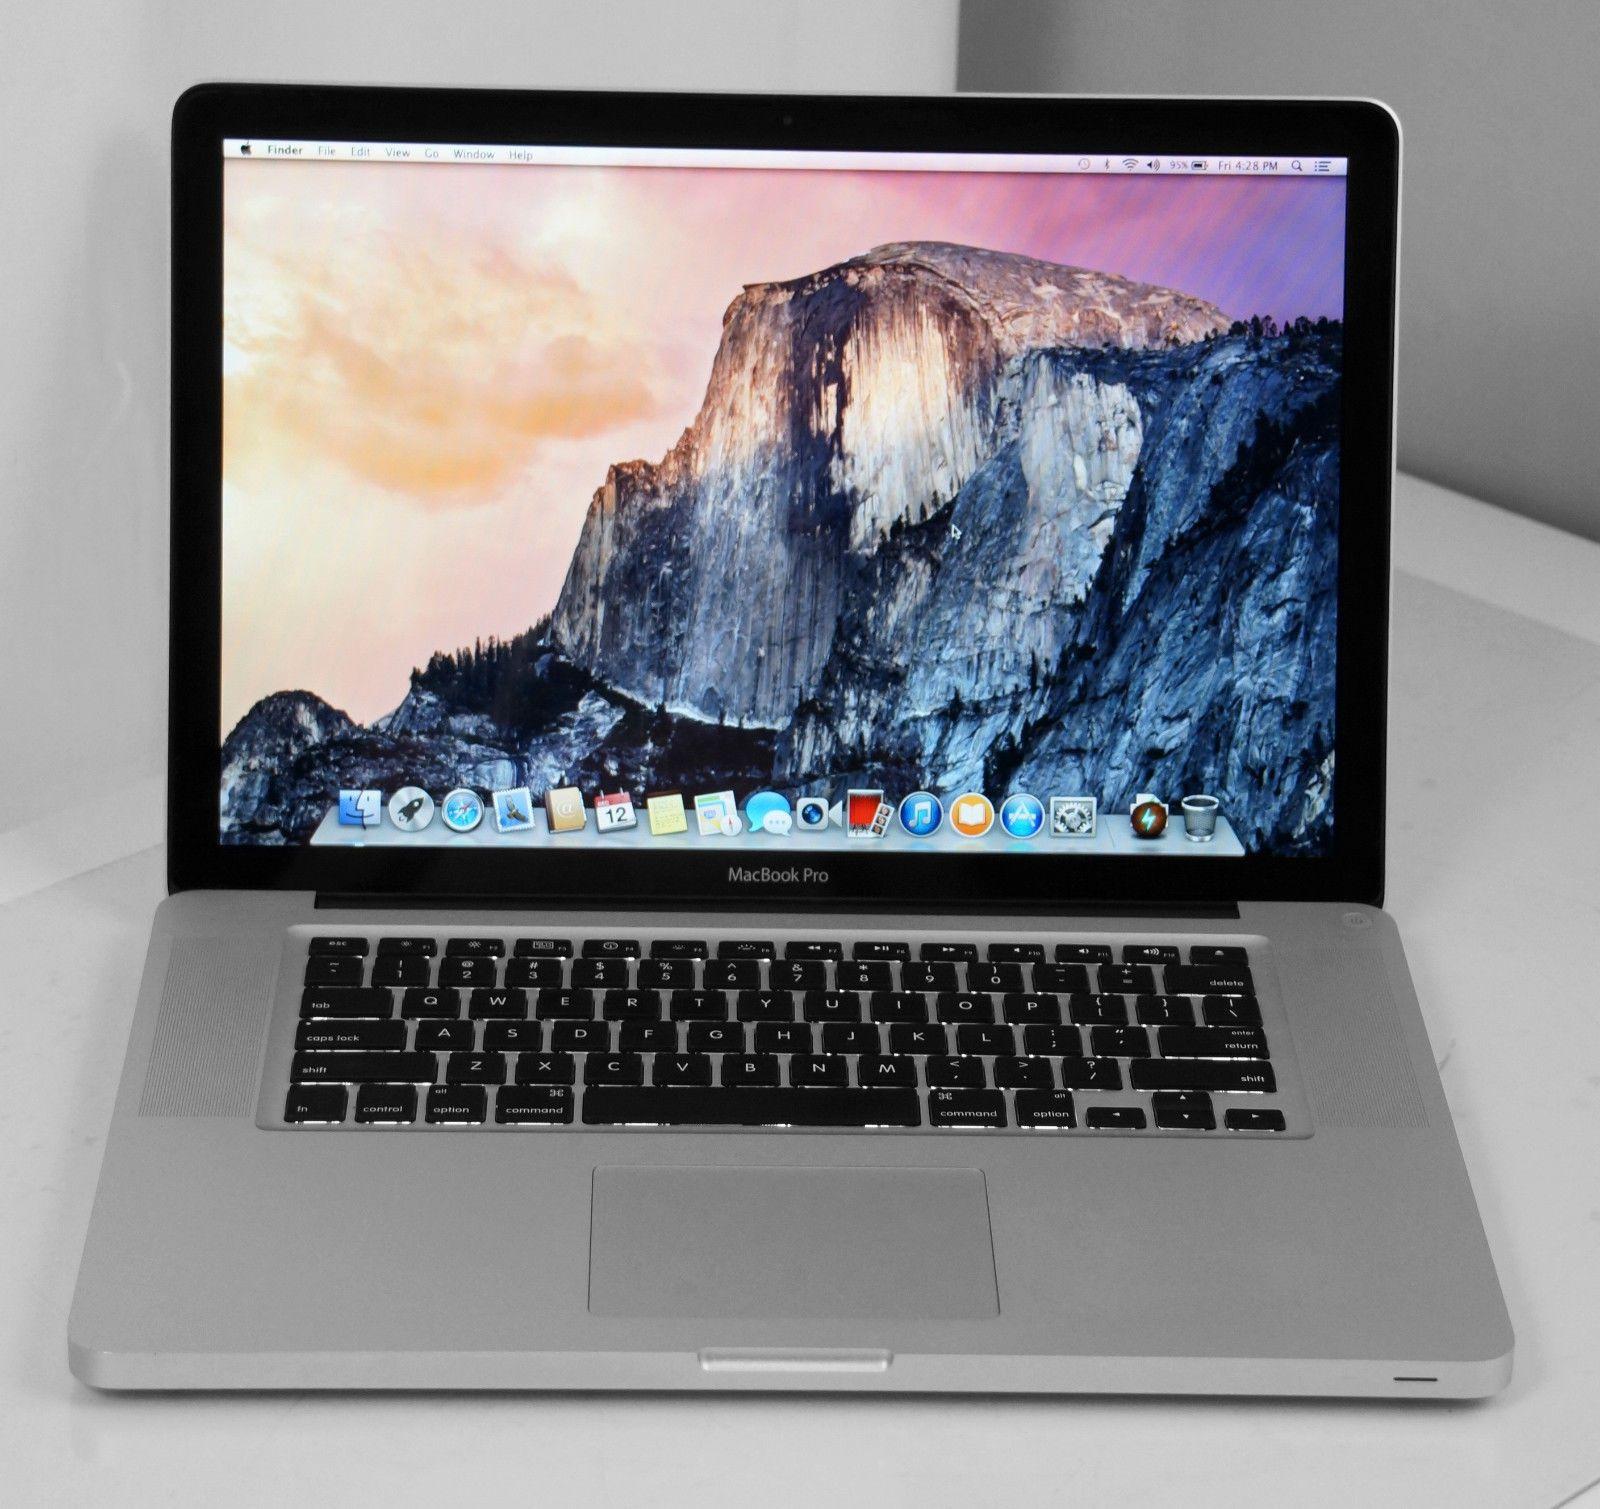 "13"" Apple MacBook Pro 2009 2.53GHz Core 2 Duo  8GB 500GB  MB991LL/A  Warranty"